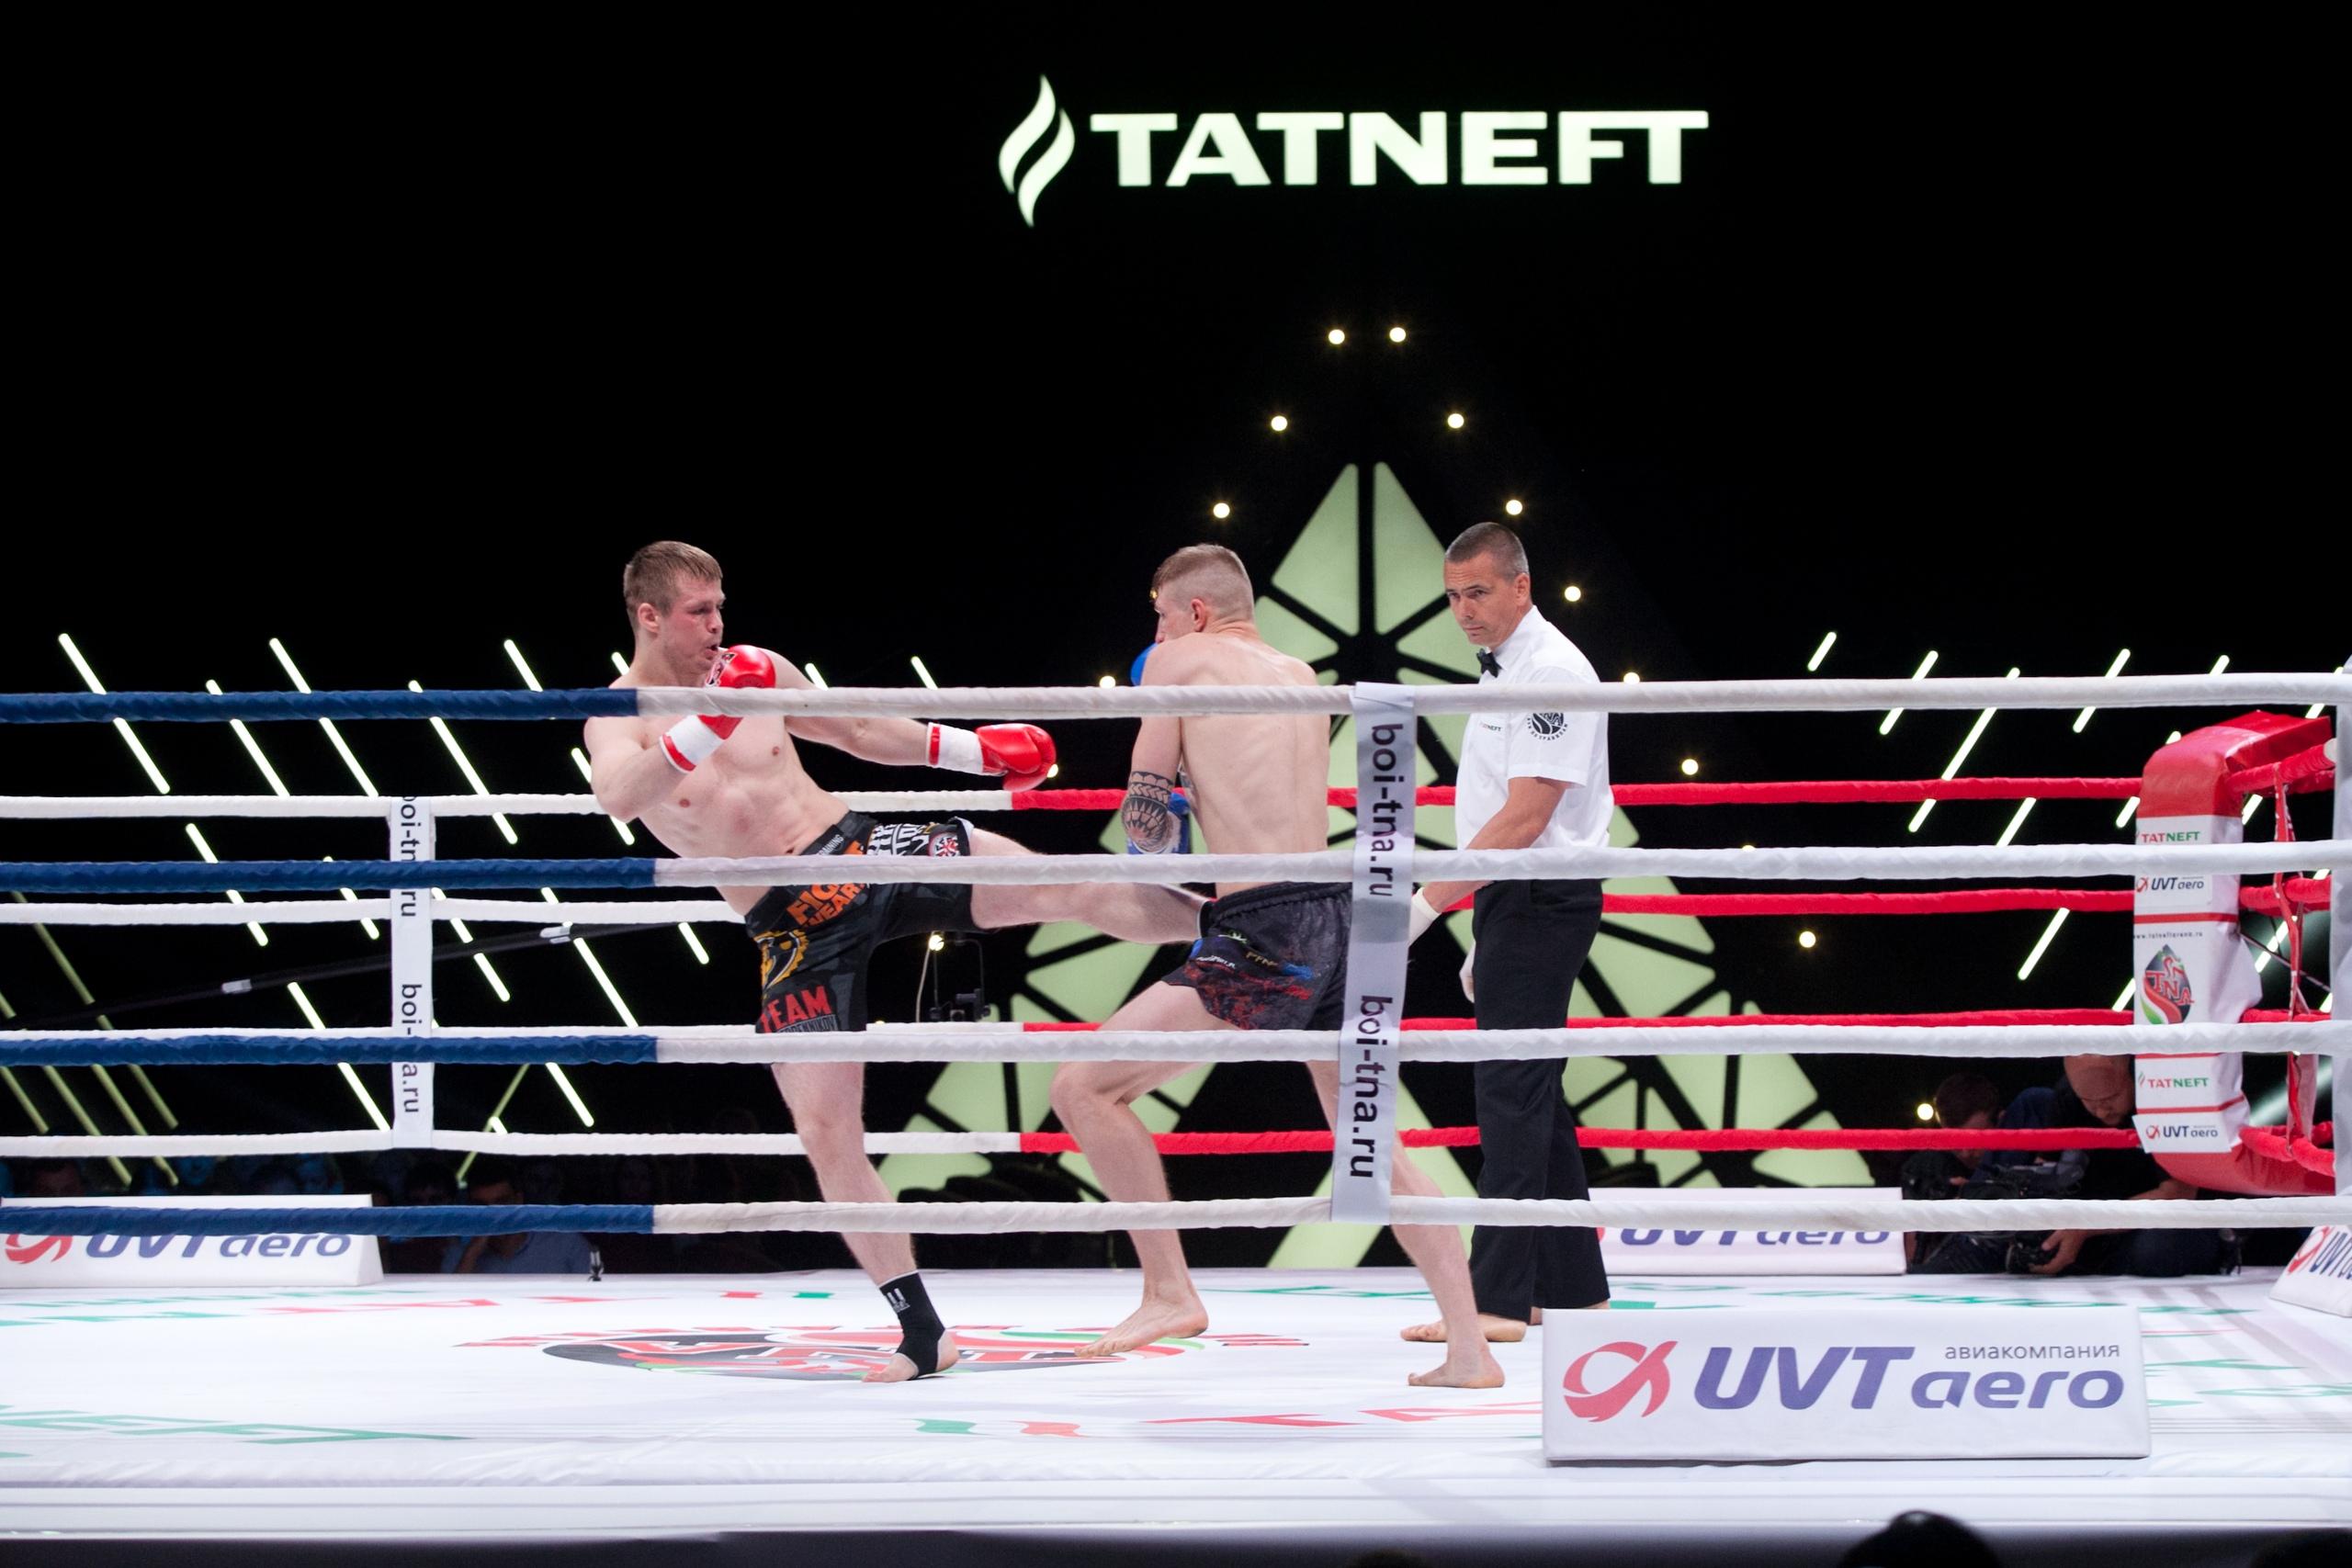 tna kickboxing serebrennikov konstantin kondratiev ivan